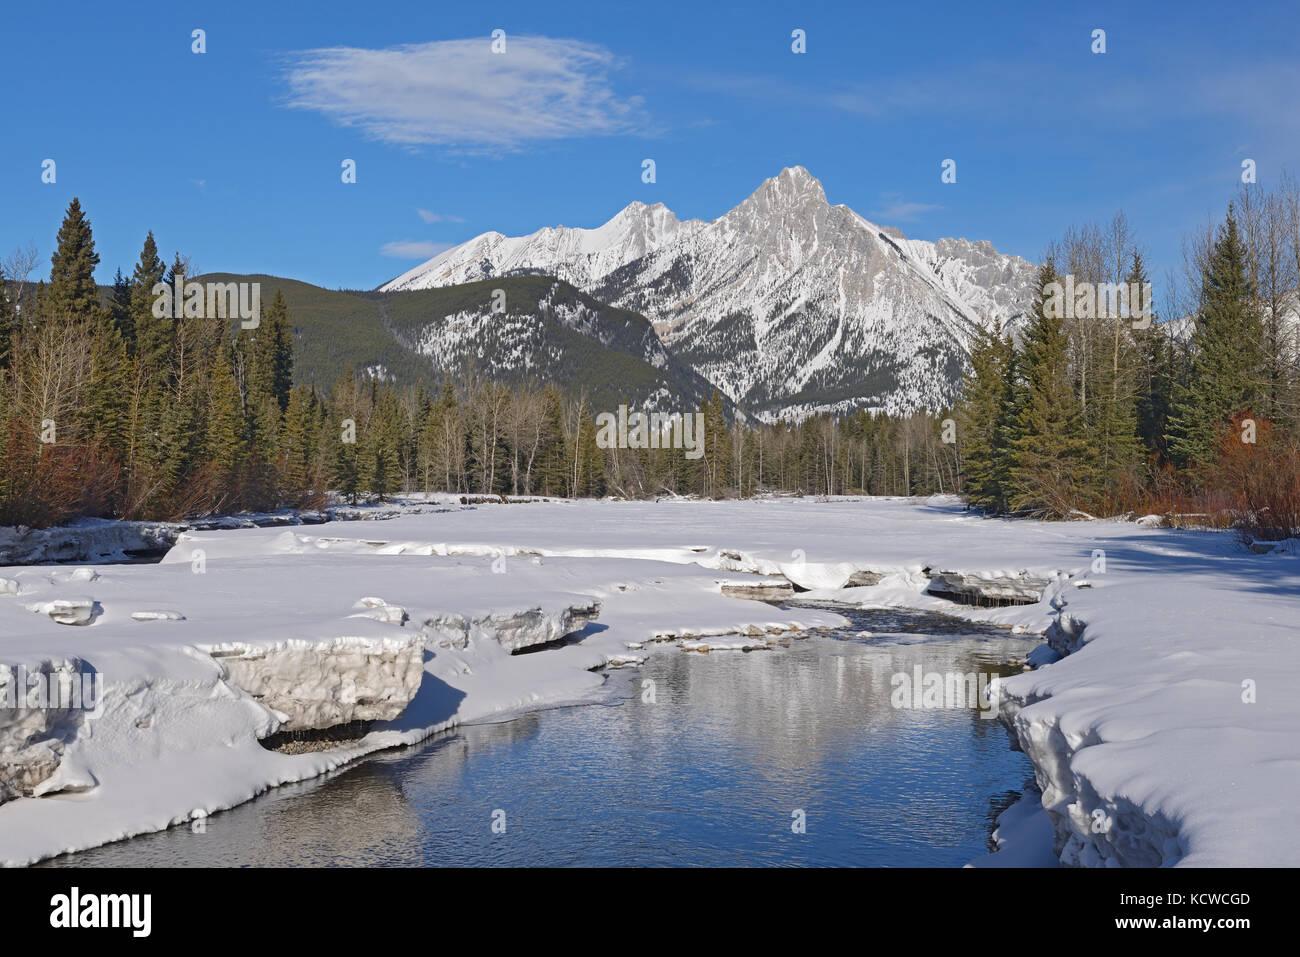 Canadian Rockies in winter, Kananaskis River and Mt. Lorette, Kananaskis Country, Alberta, Canada - Stock Image